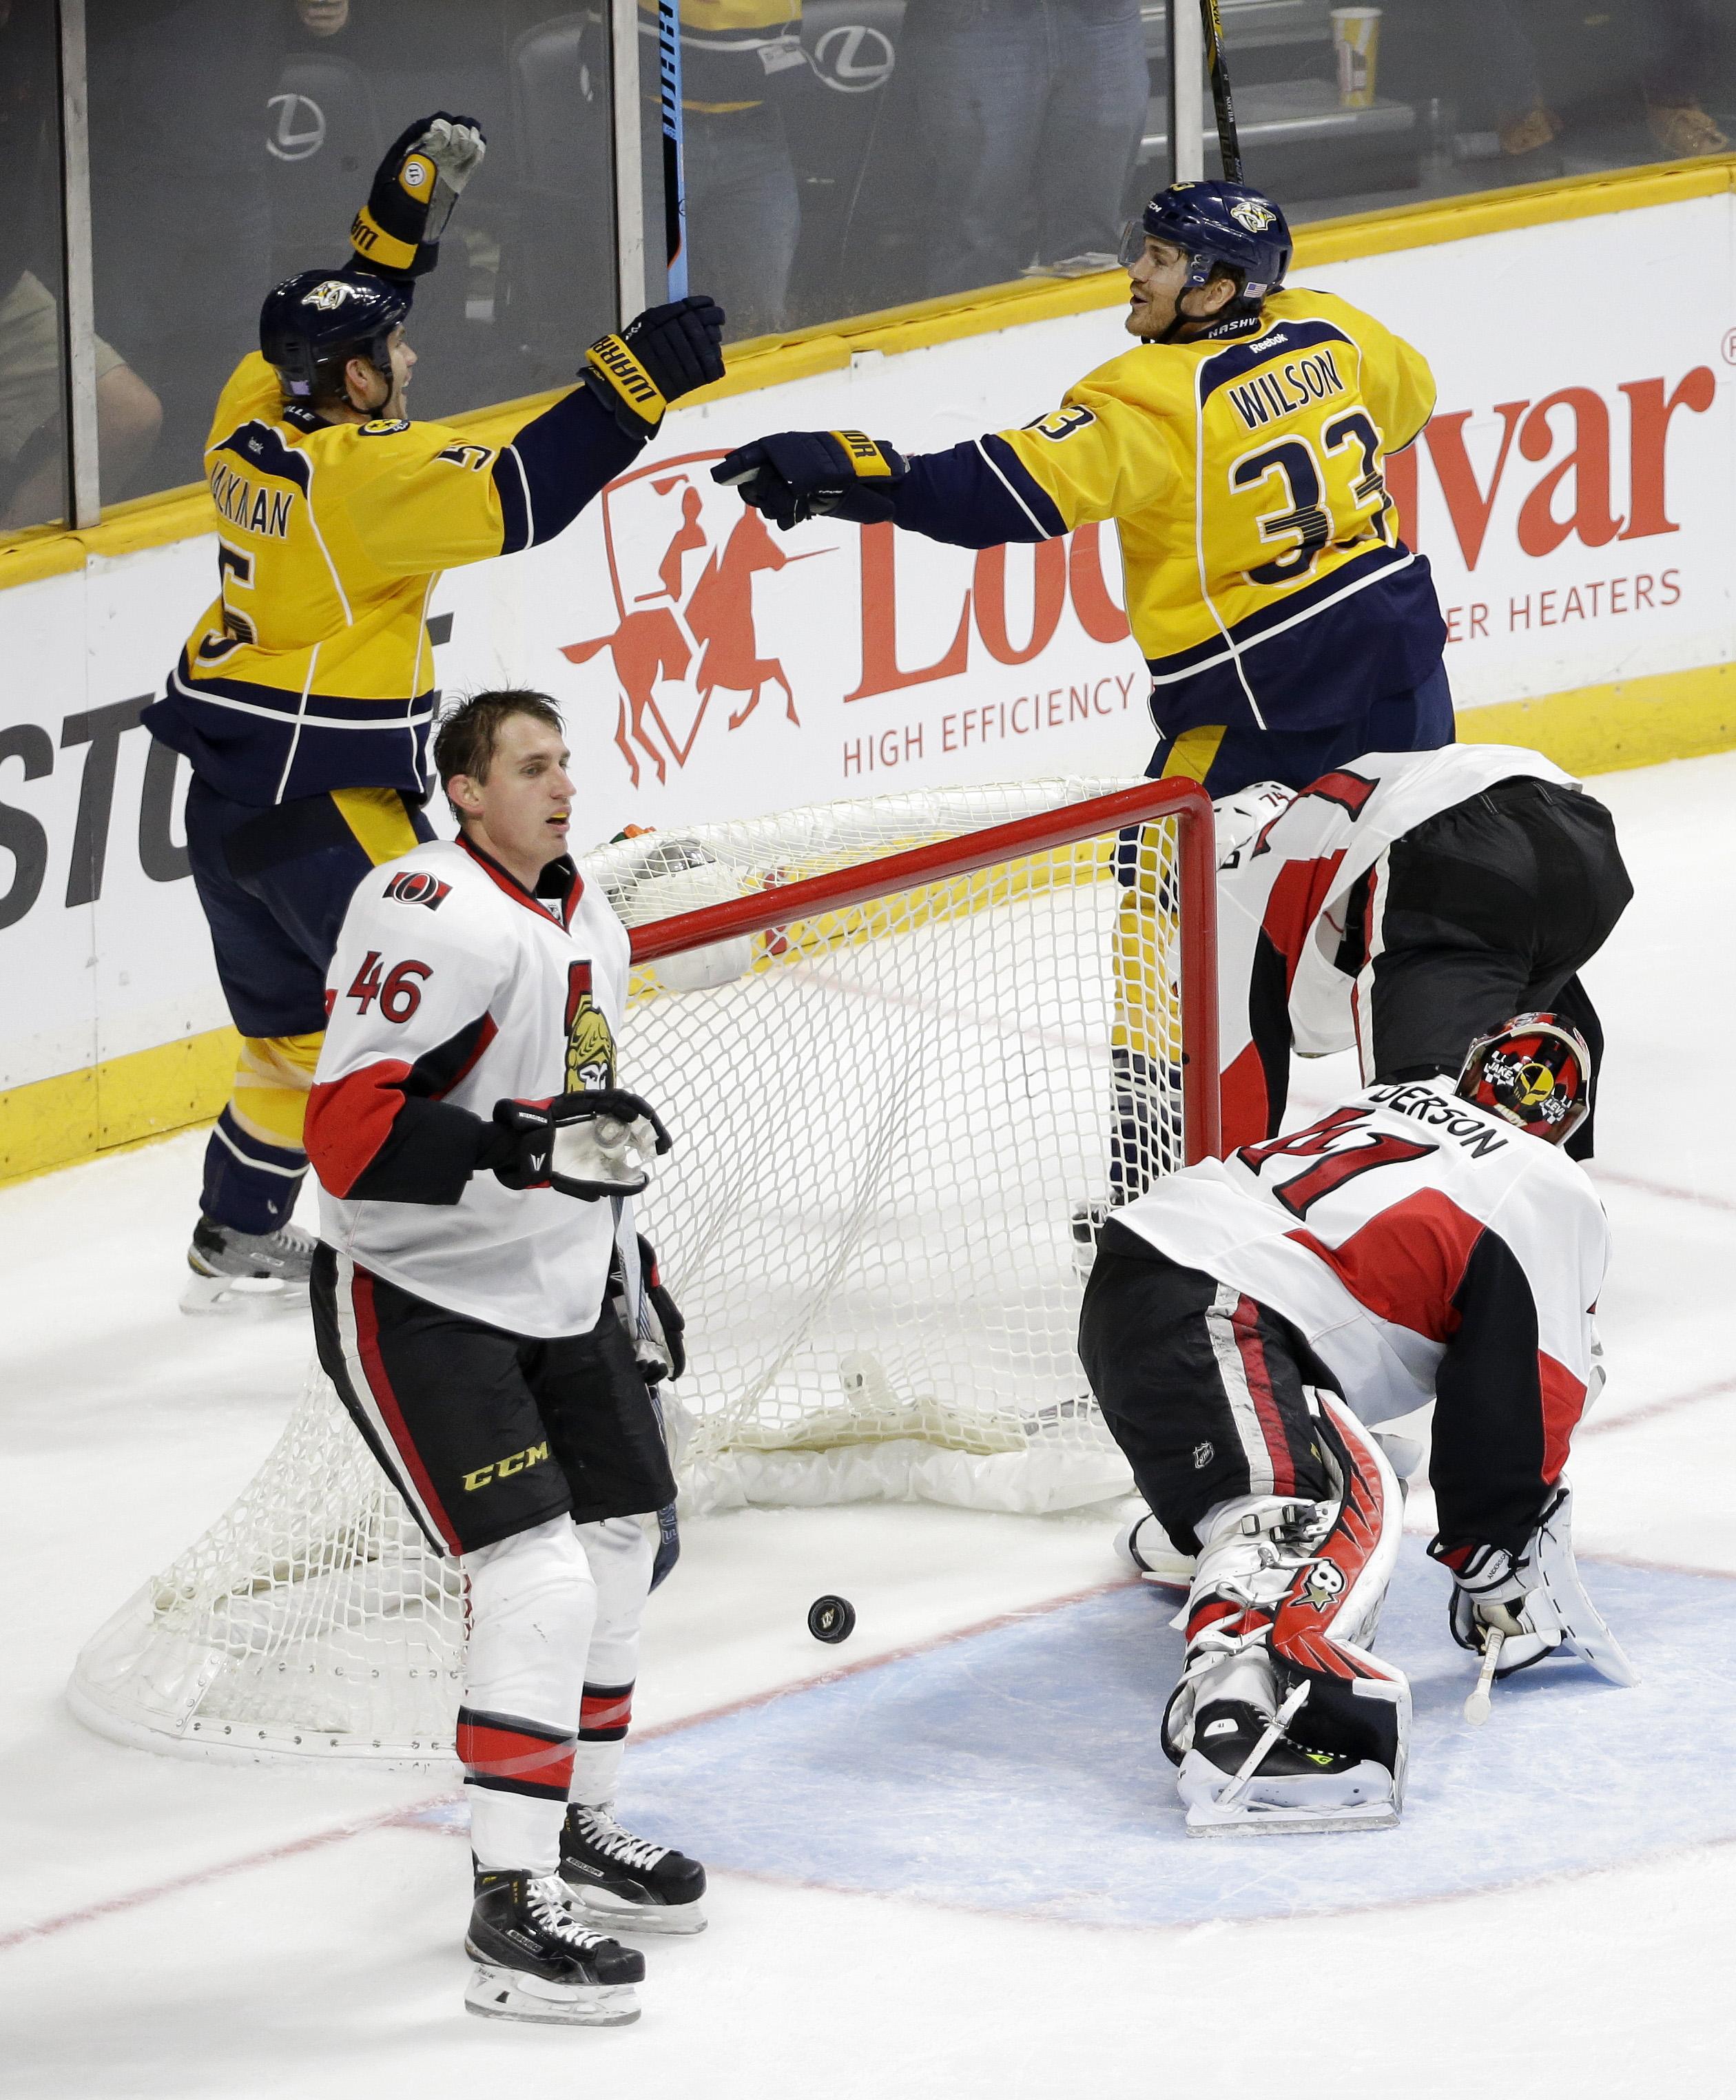 Nashville Predators defenseman Barret Jackman (5) celebrates with Colin Wilson (33) after Jackman scored against Ottawa Senators goalie Craig Anderson (41) during the third period of an NHL hockey game Tuesday, Nov. 10, 2015, in Nashville, Tenn.  At front